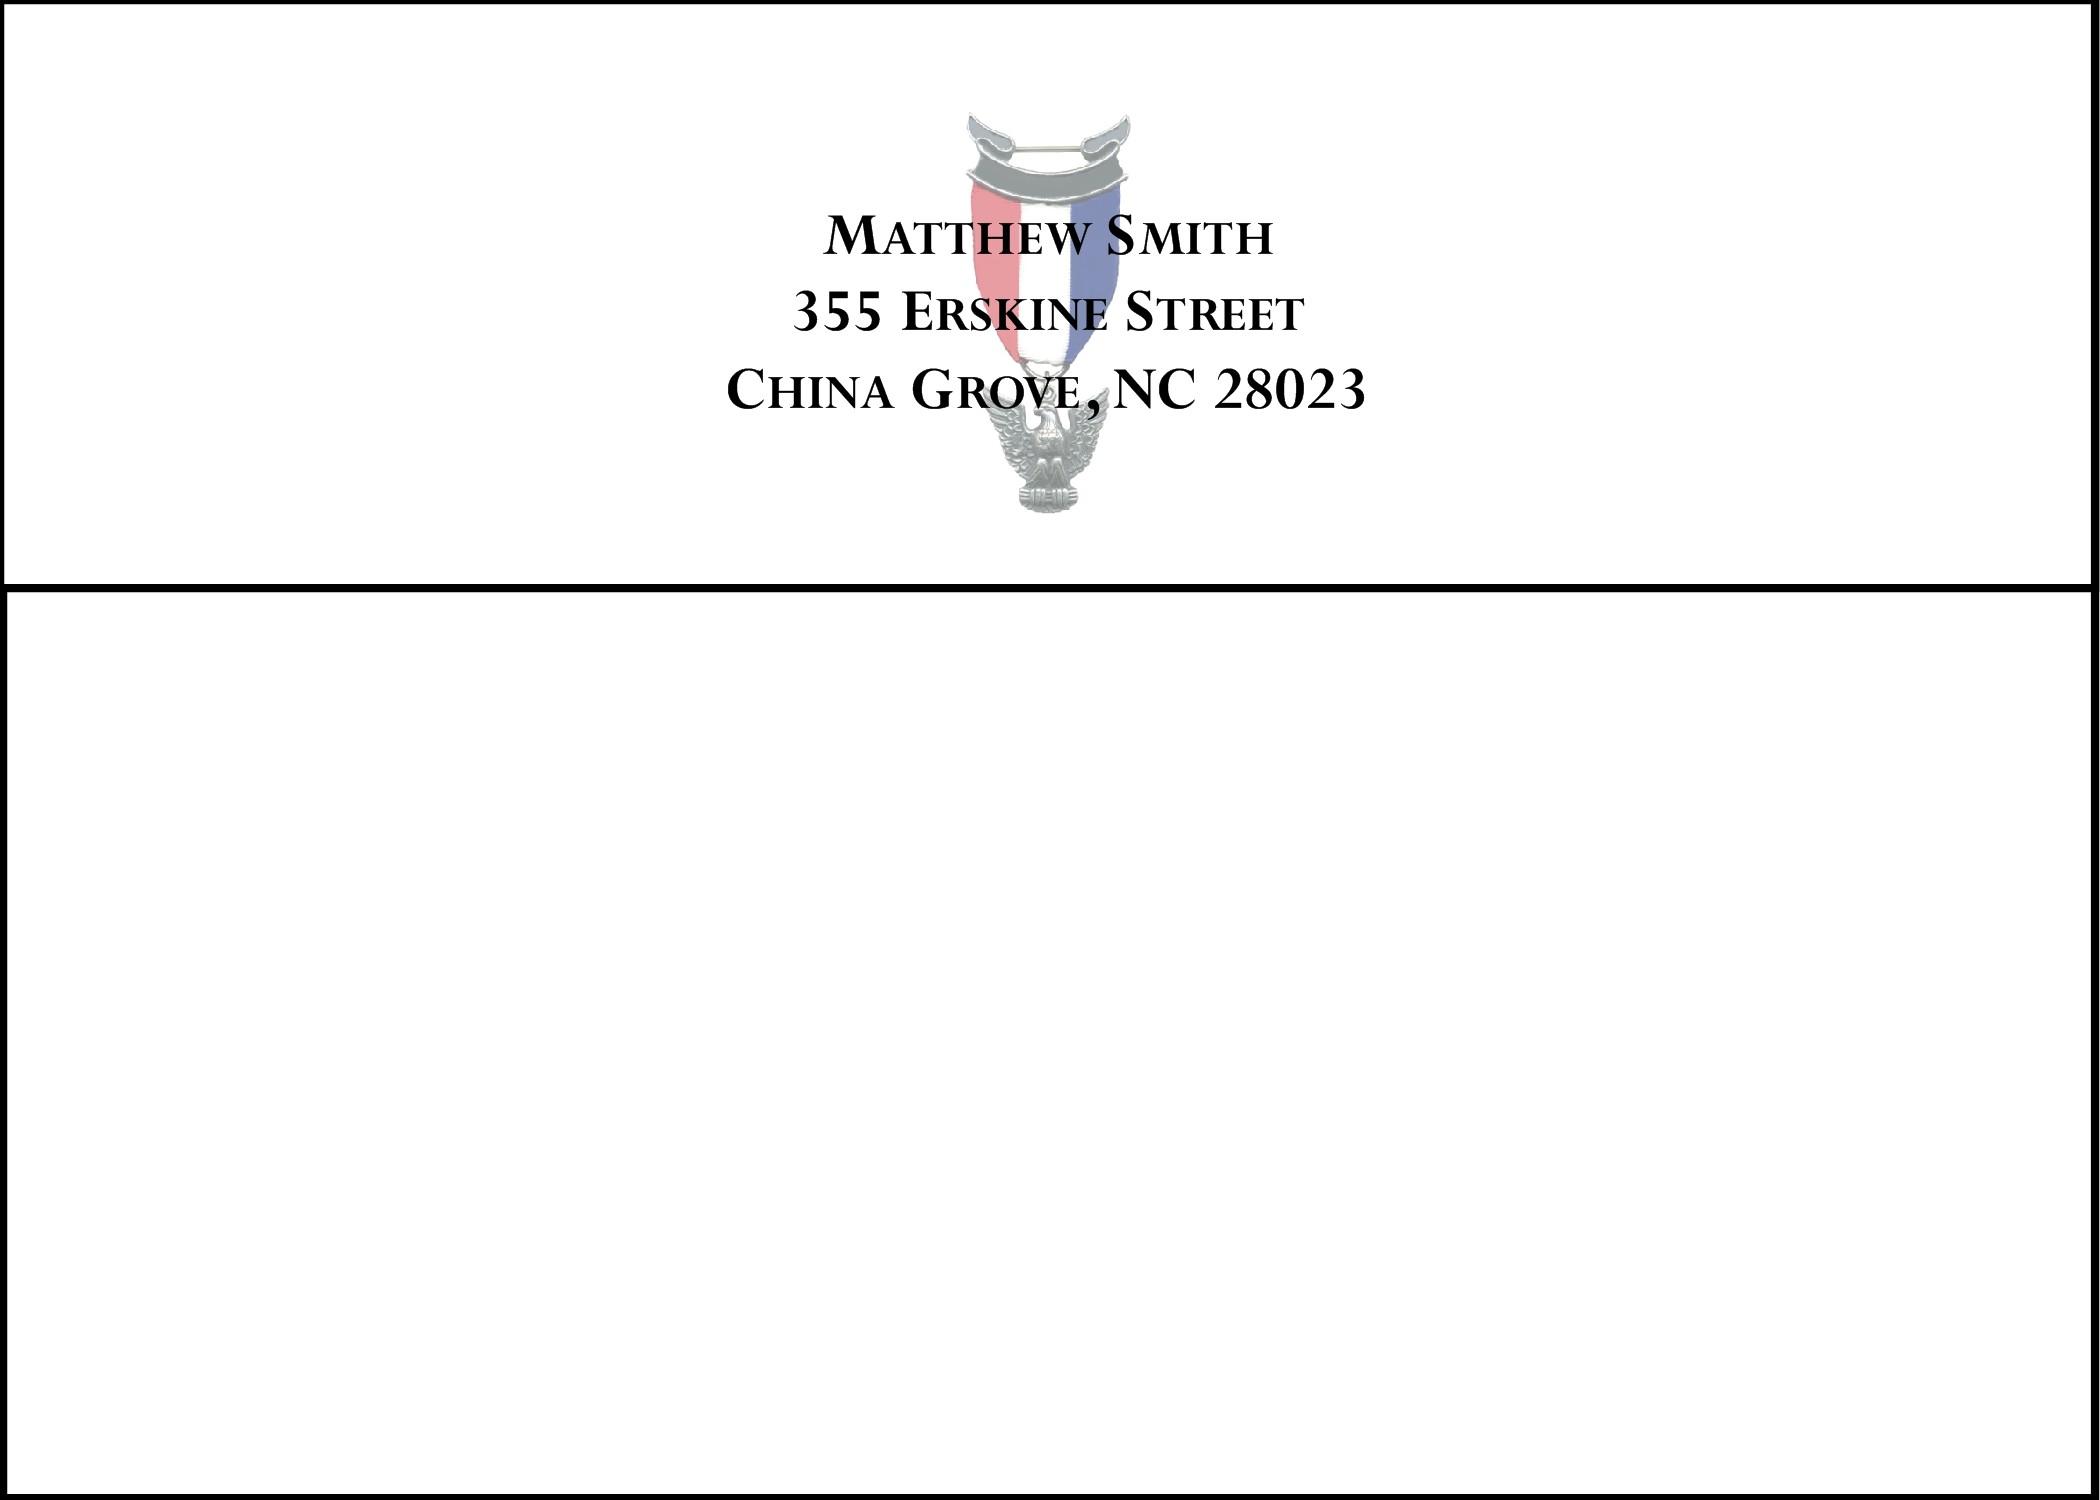 Envelope3 Jpg